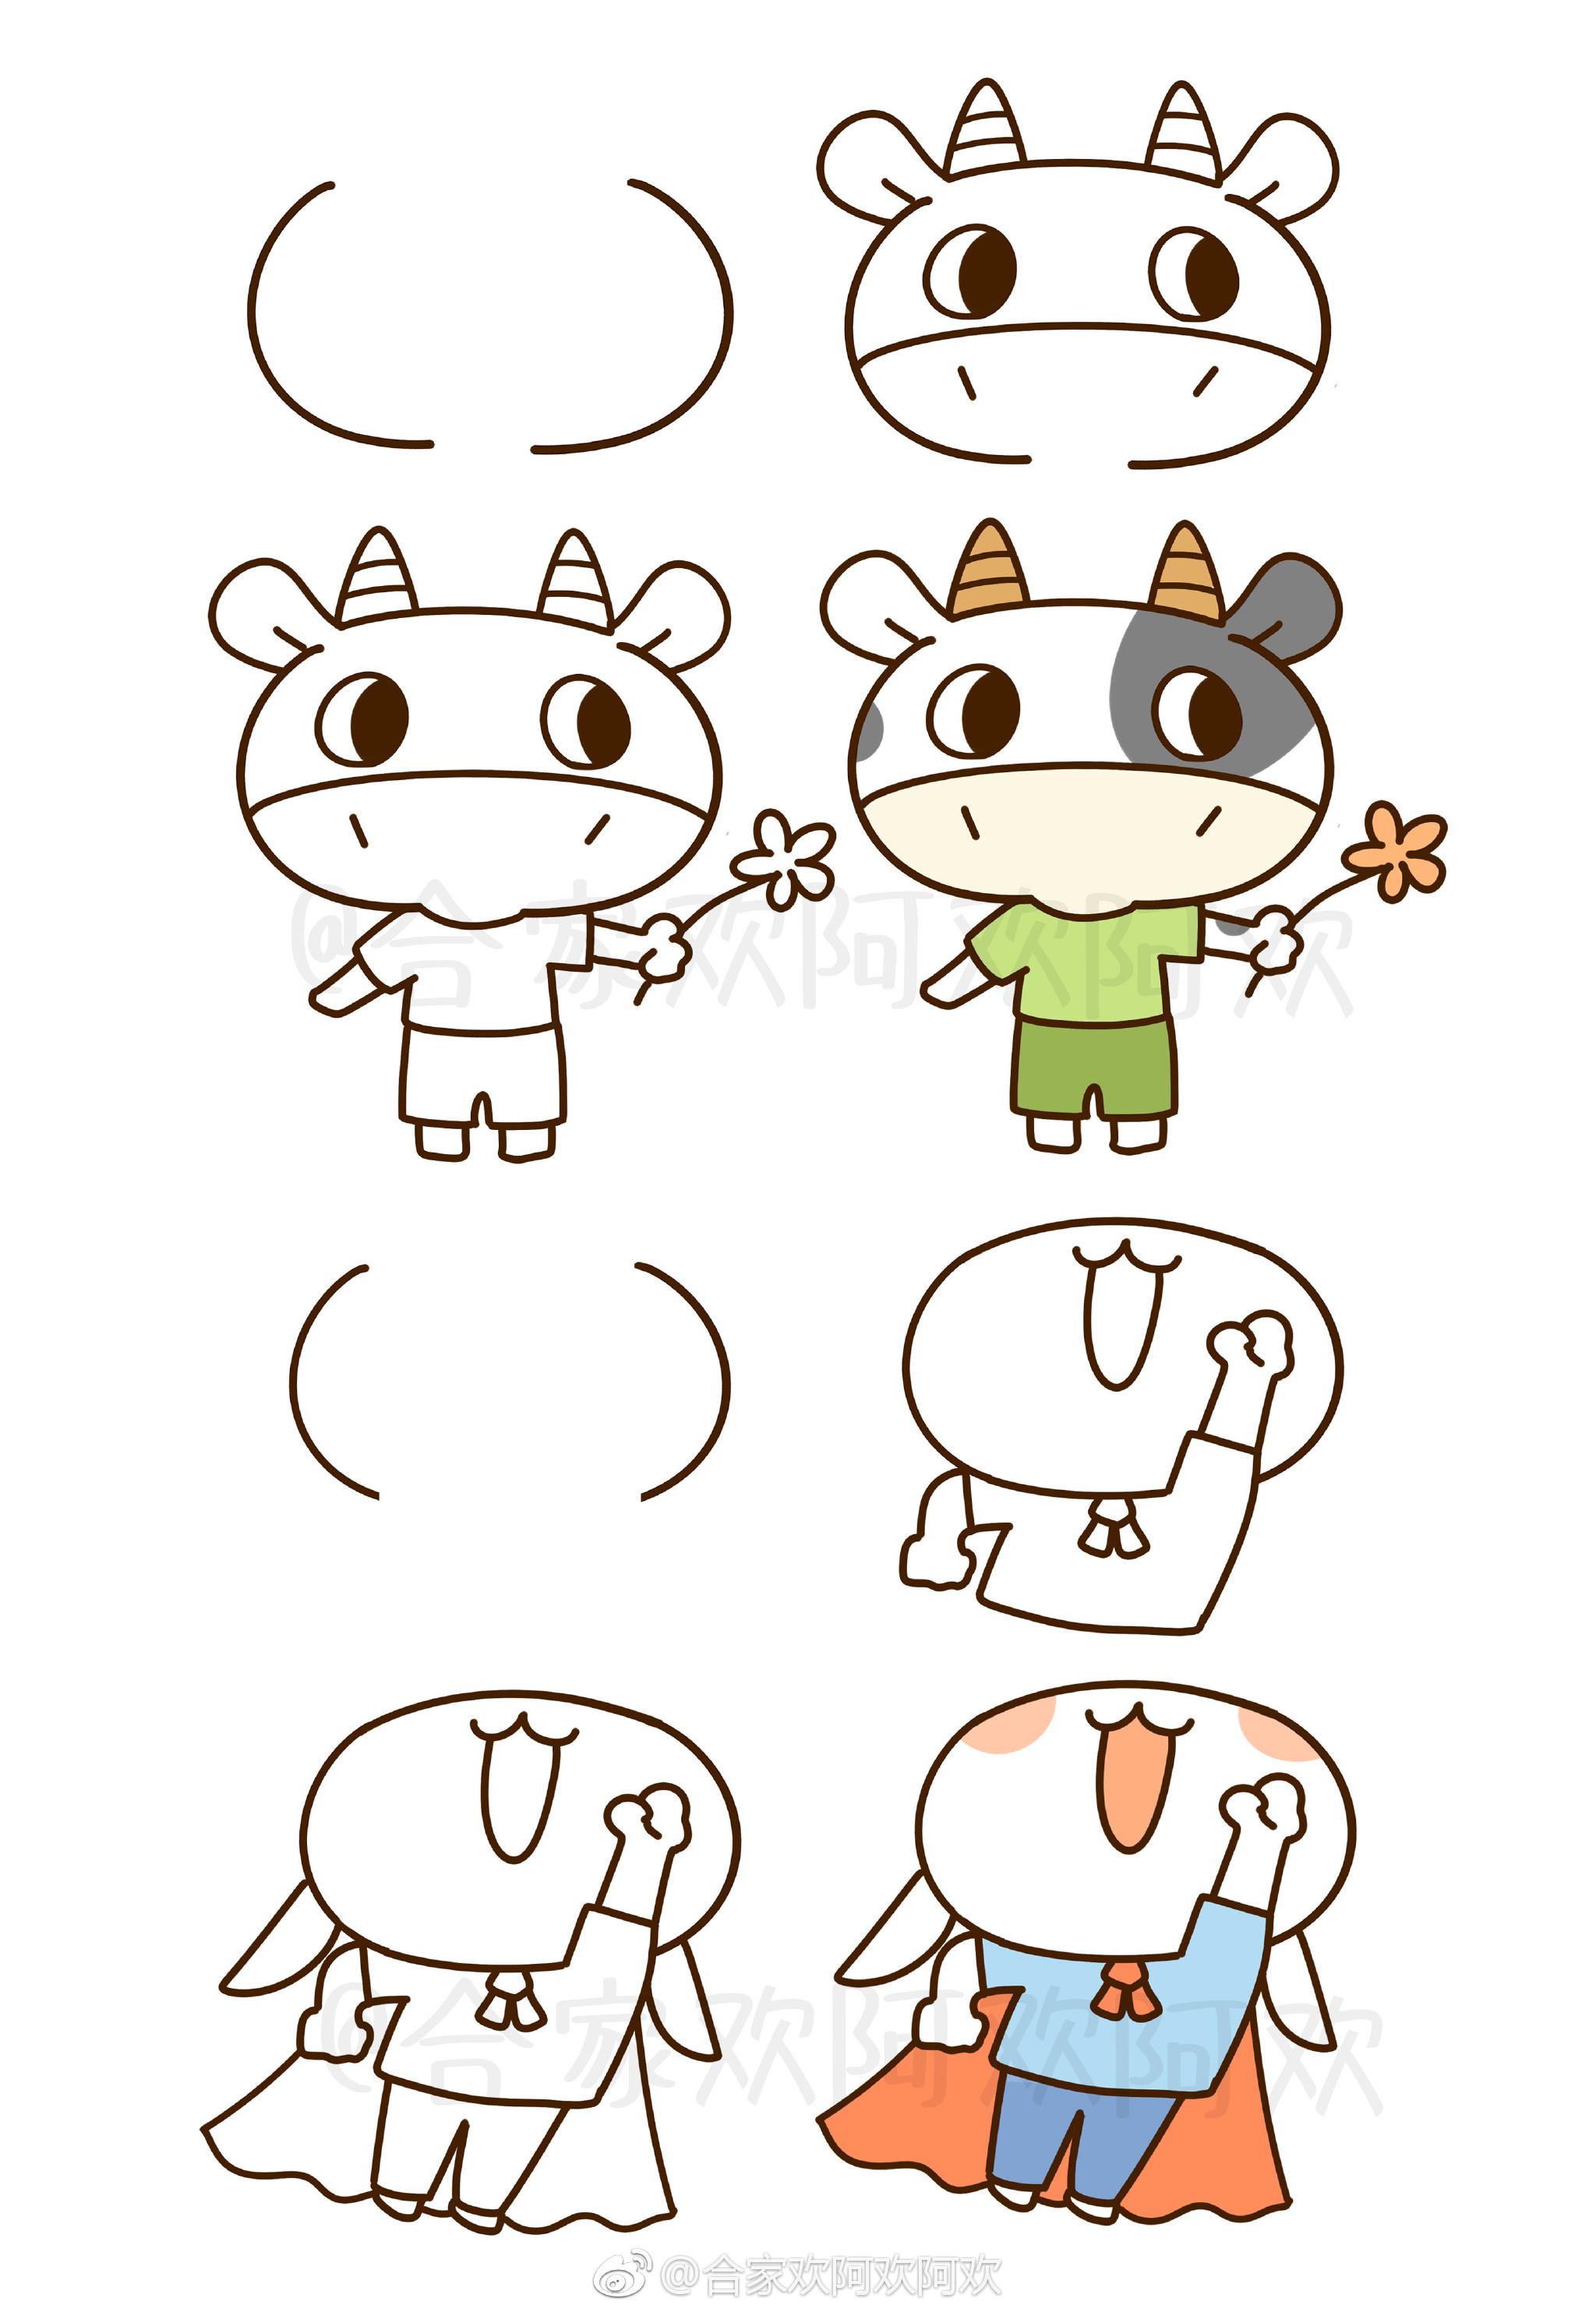 ( =ω= )由一个括号形状,画出的各种小动物简笔画图片